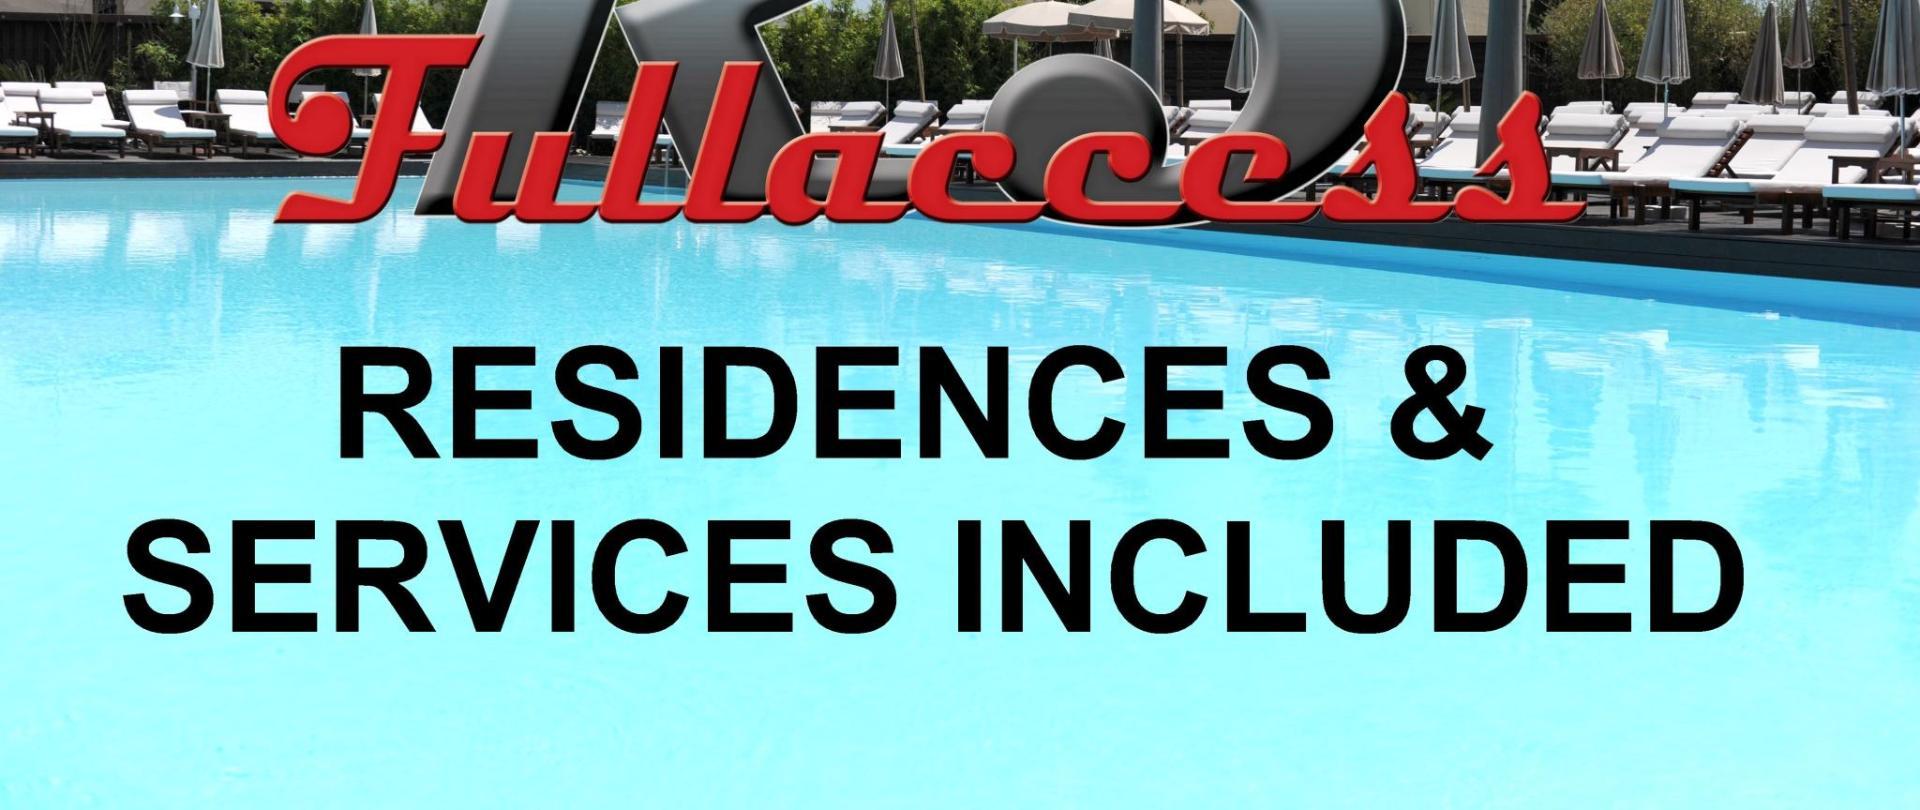 RESIDENCES SERVICES.jpg